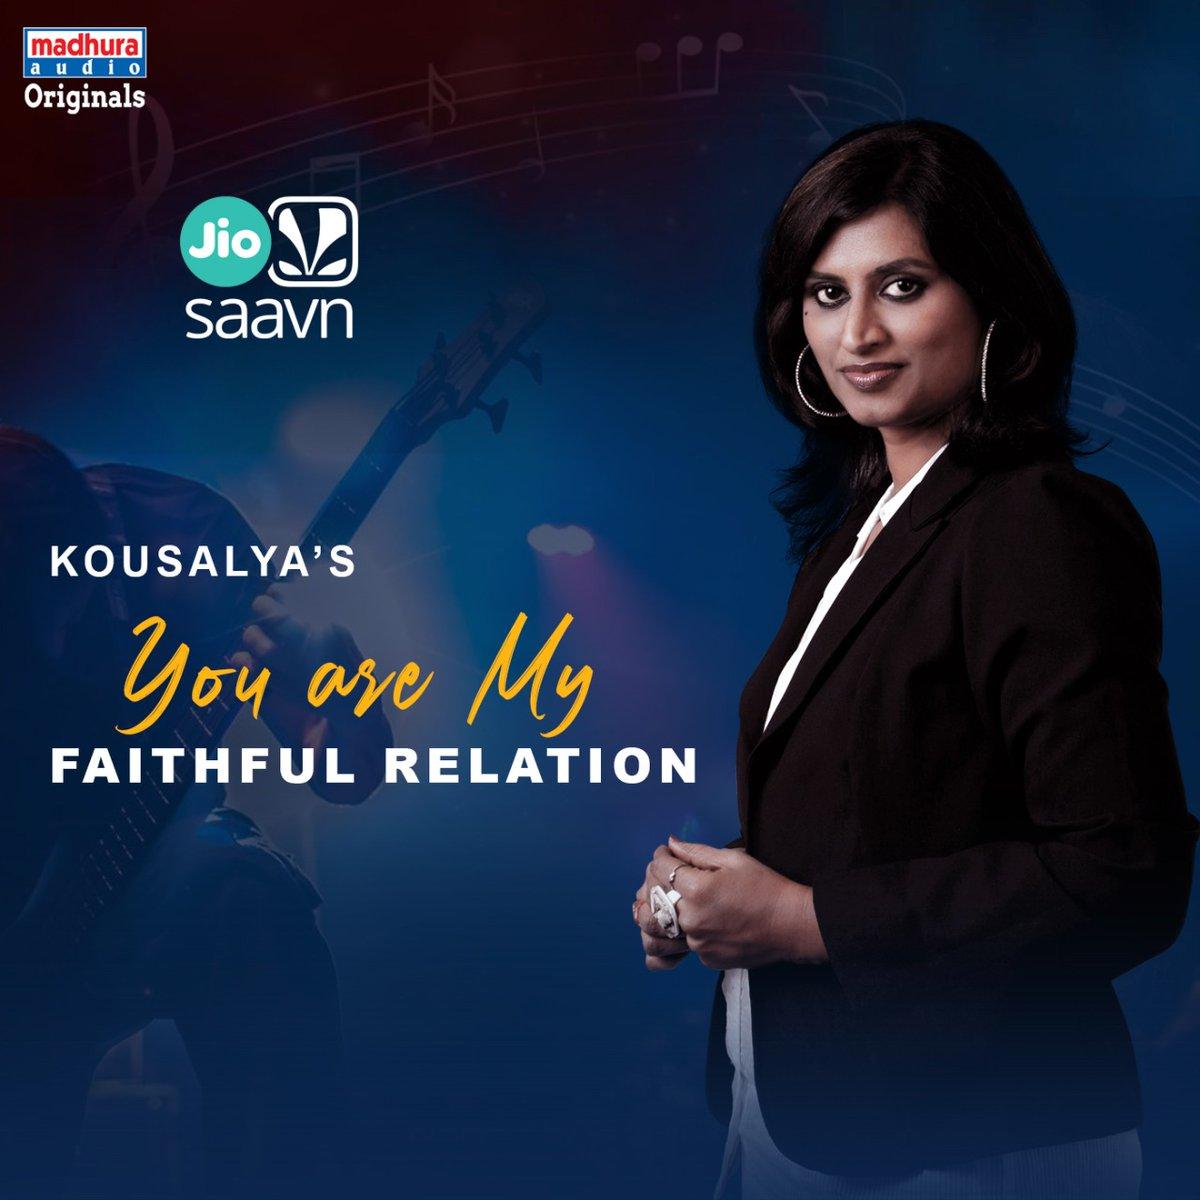 Talented Singer @Kousalyapotturi's #YouAreMyFaithfulRelation IS Streaming On Your Favorite OTT App  @JioSaavn: https://www.jiosaavn.com/song/you-are-my-faithful-relation/QAsYfCR2Z3E…pic.twitter.com/5f2eBi0Z4n